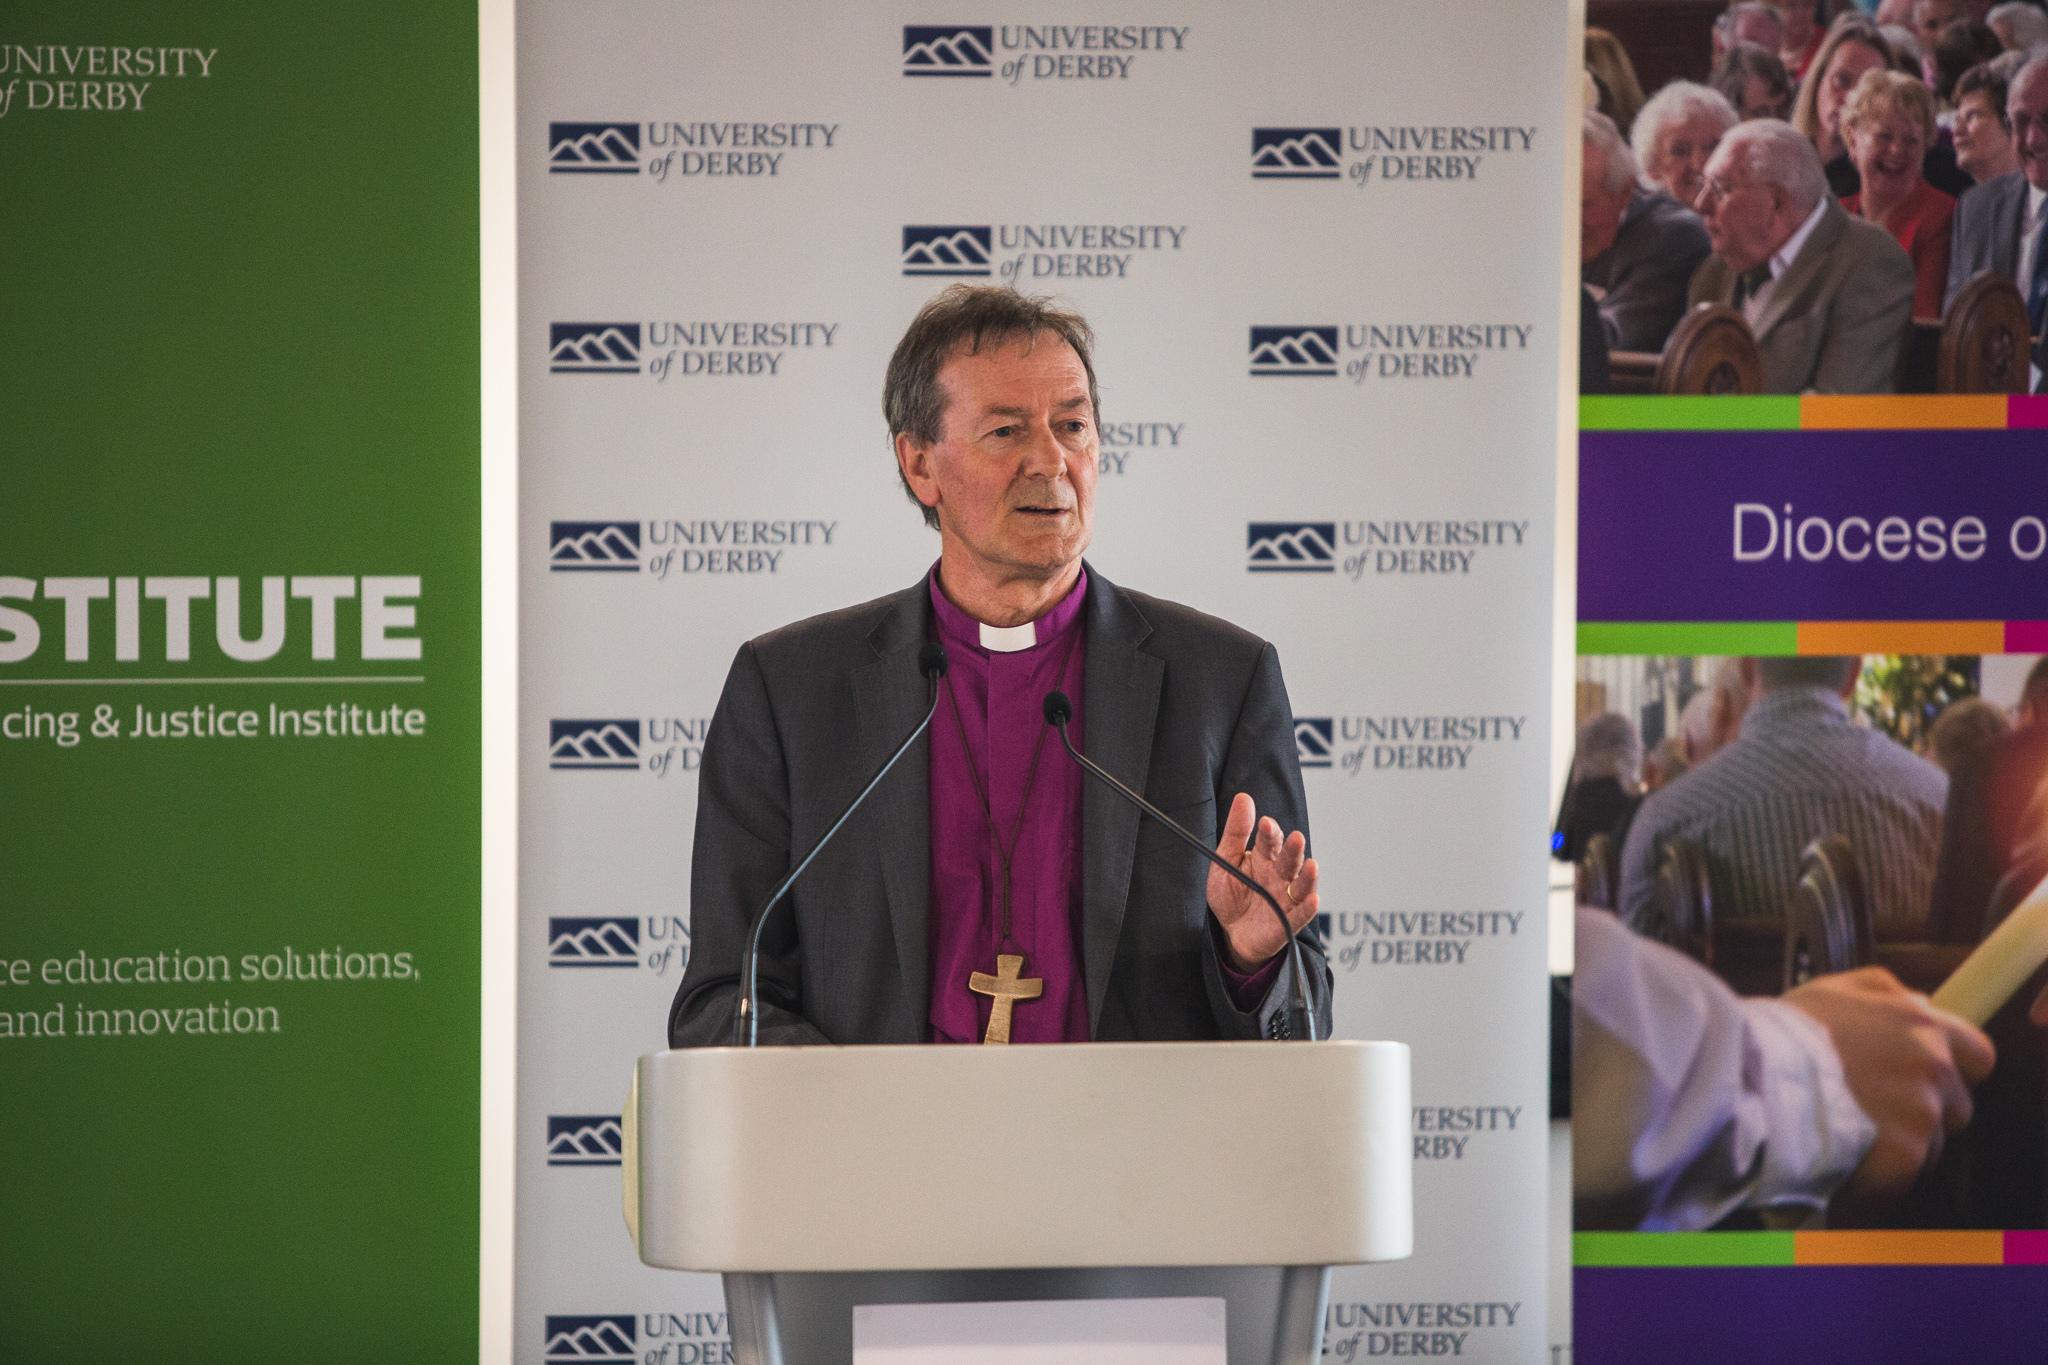 Bishop Alastair Redfern addresses business leaders at Action 2030